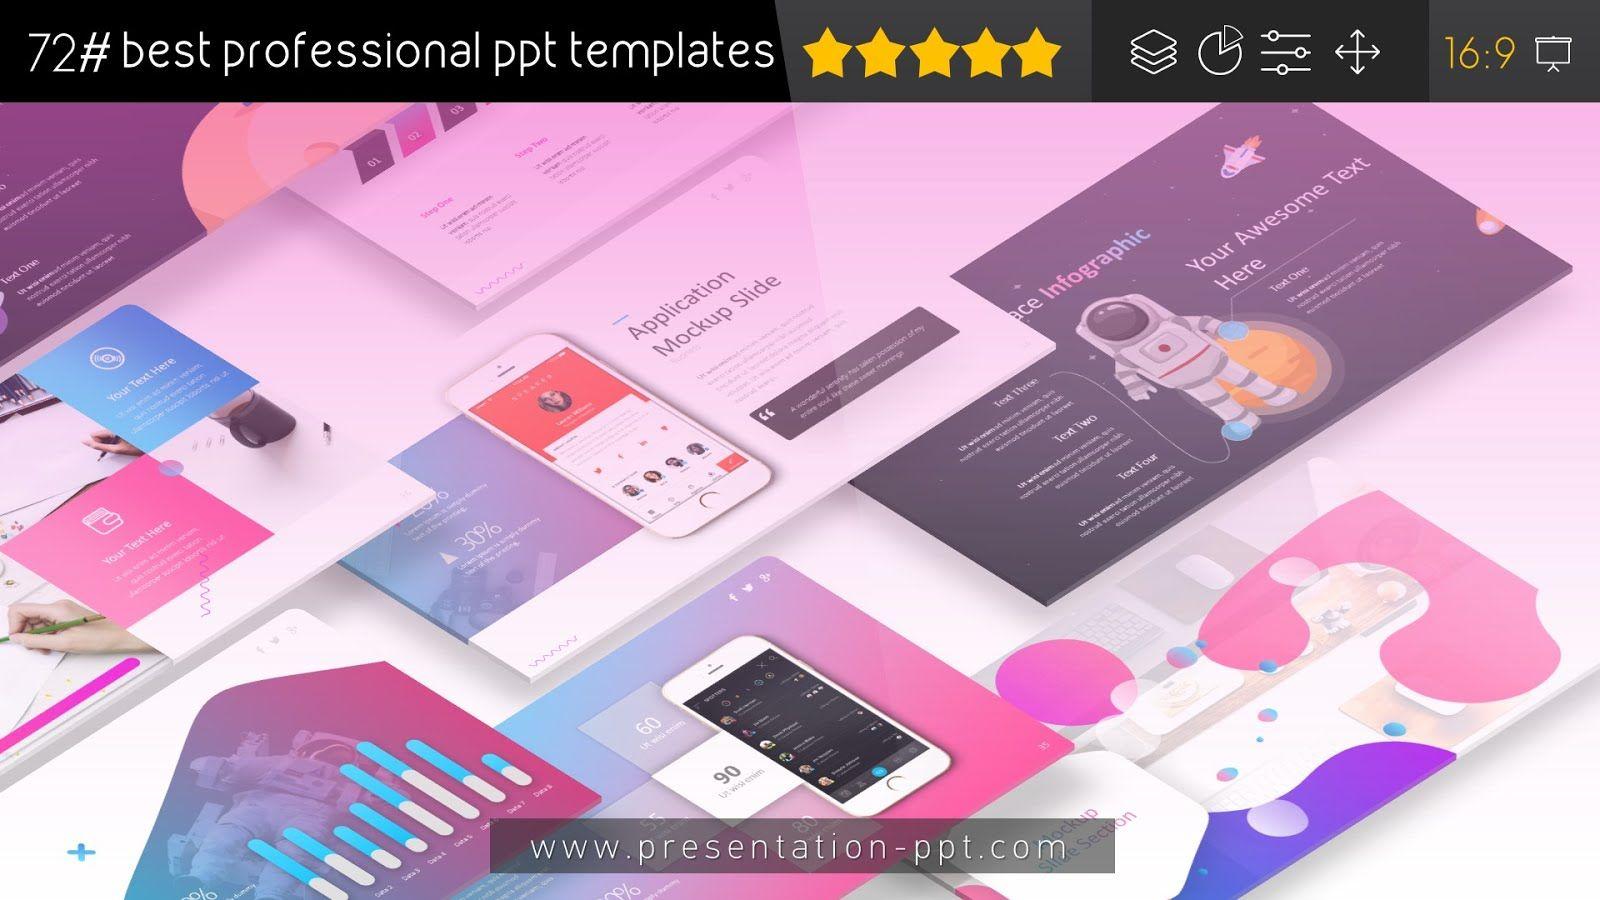 Free Modern Powerpoint Templates Design Powerpoint Presentation Templates Powerpoint Template Design